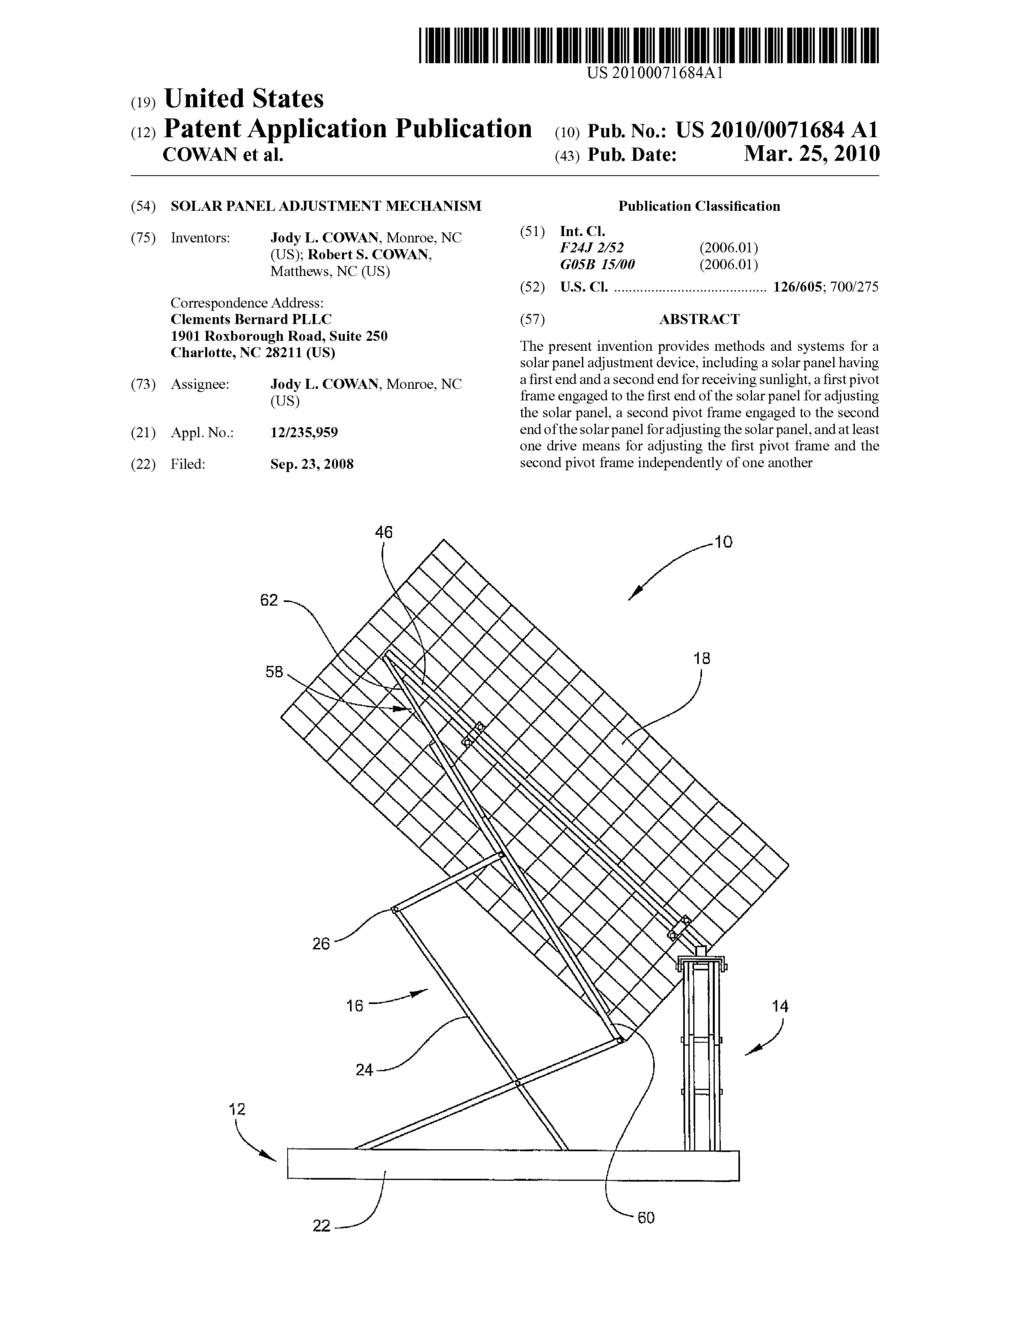 Solar Panel Adjustment Mechanism Diagram Schematic And Image 01